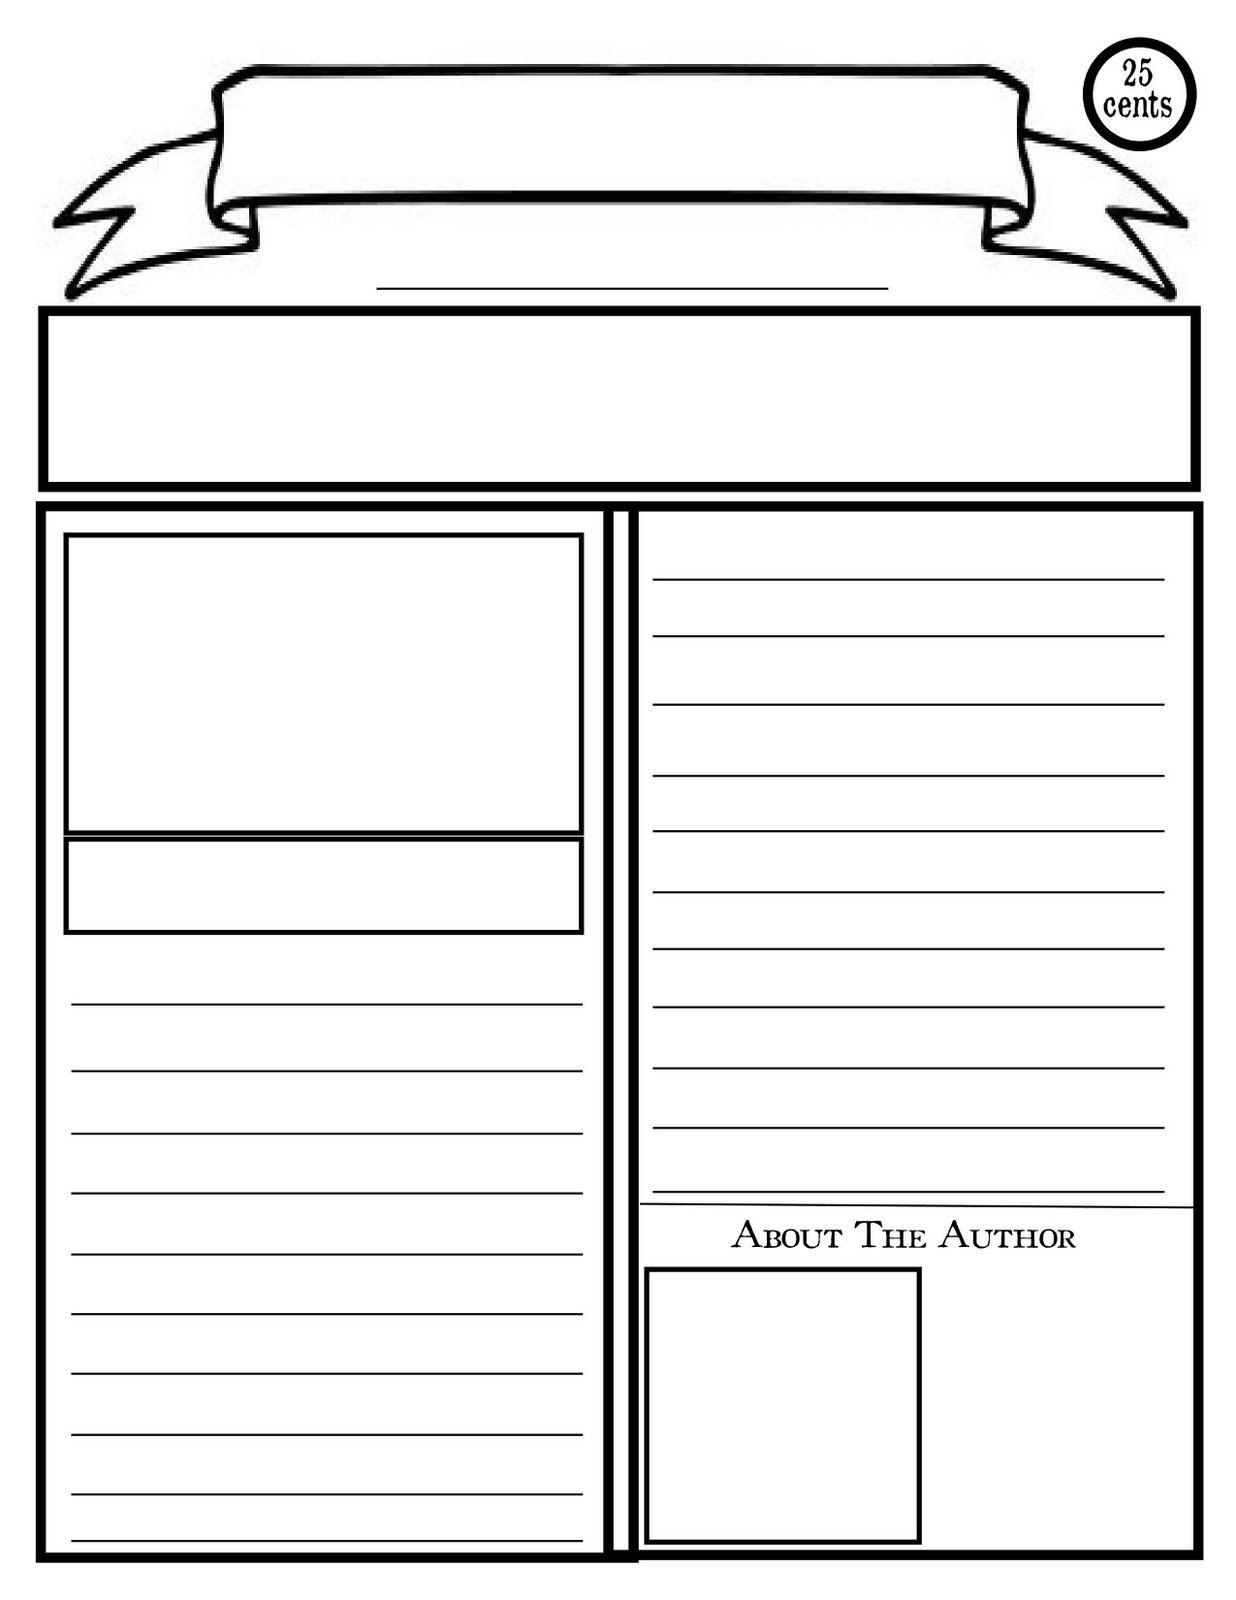 Blank Newspaper Template For Kids Printable   Homework Help - Free Printable Homework Templates